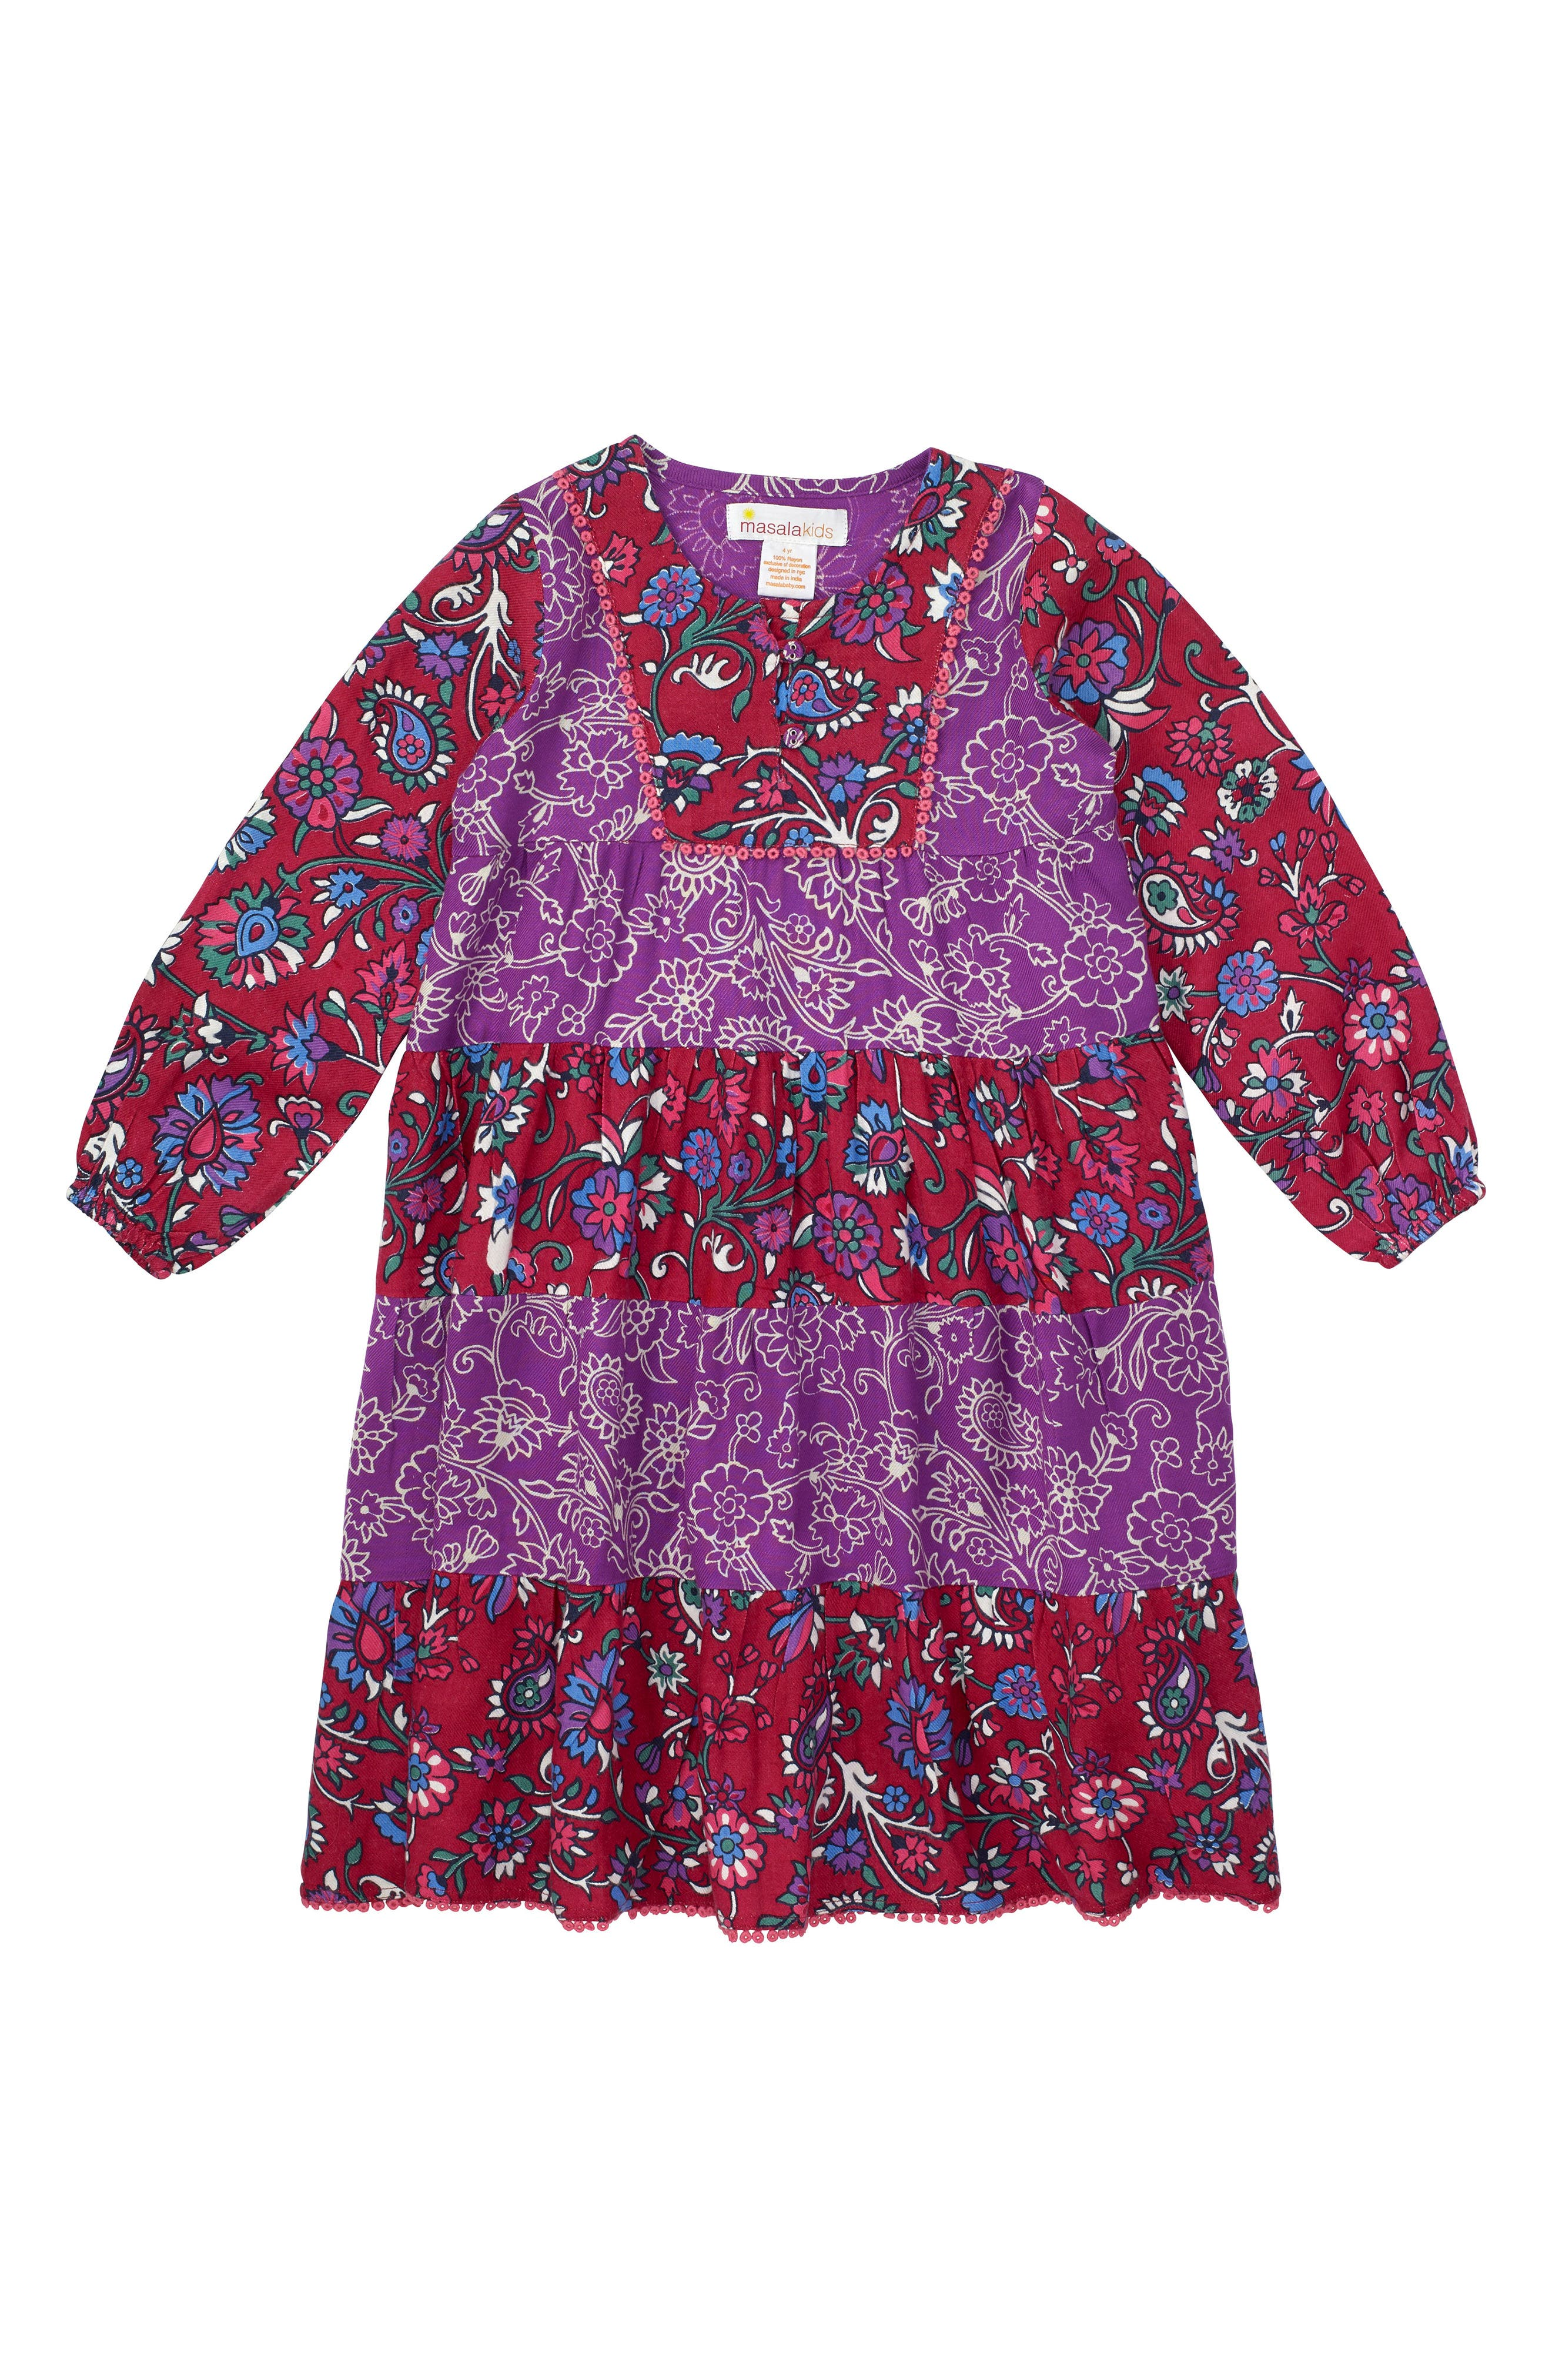 Alternate Image 1 Selected - Masala Baby Tiered Floral Dress (Toddler Girls, Little Girls & Big Girls)